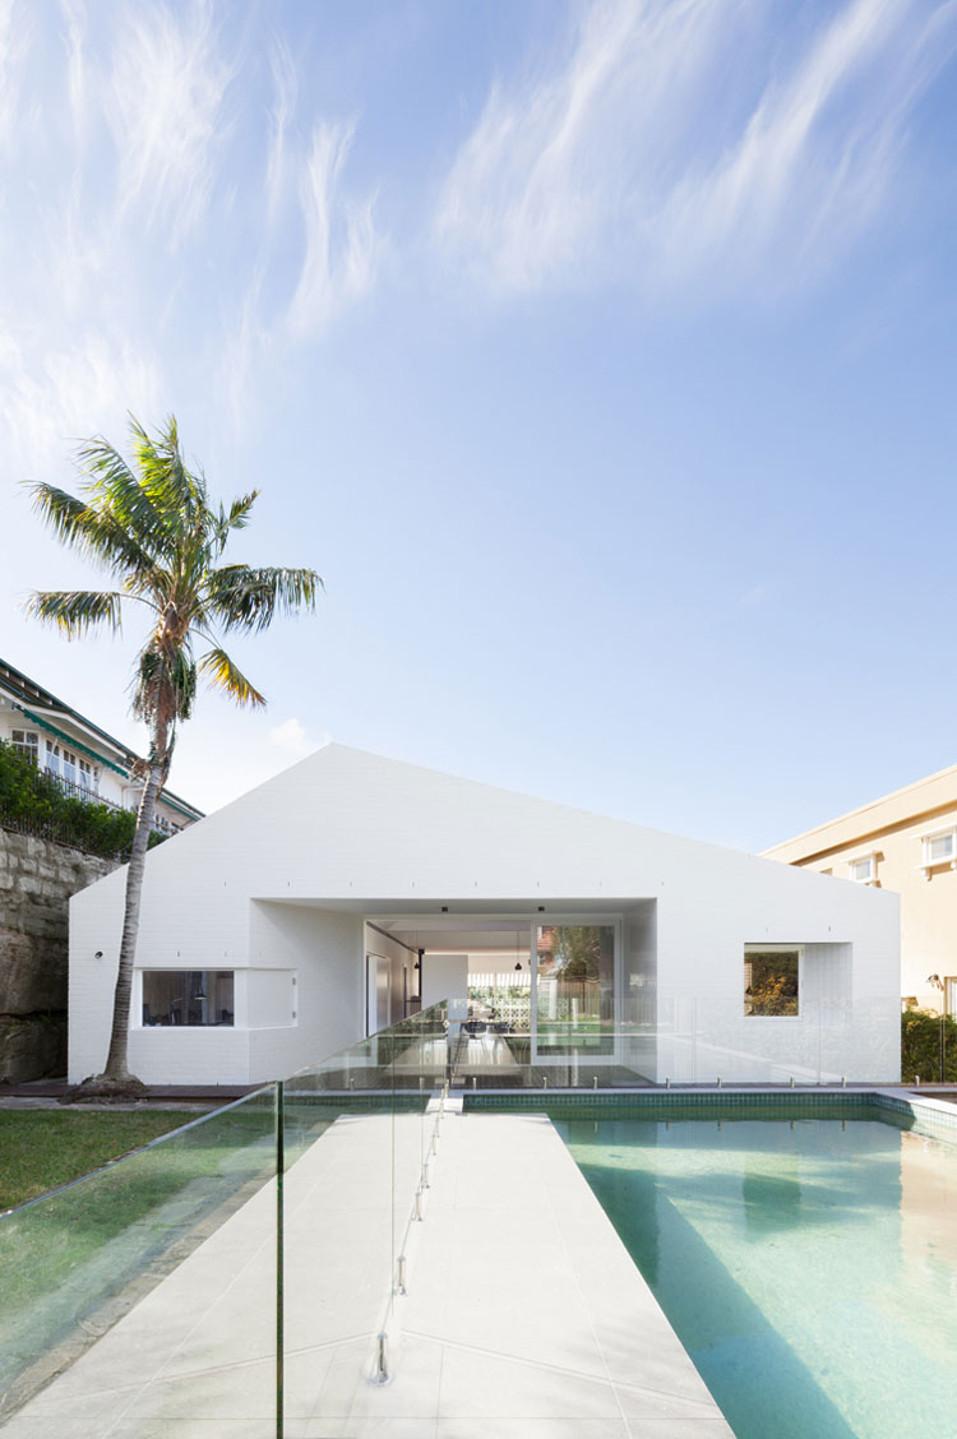 Jelanie-blog-Casa-Chapple-by-Tribe-Studio-Architects-1